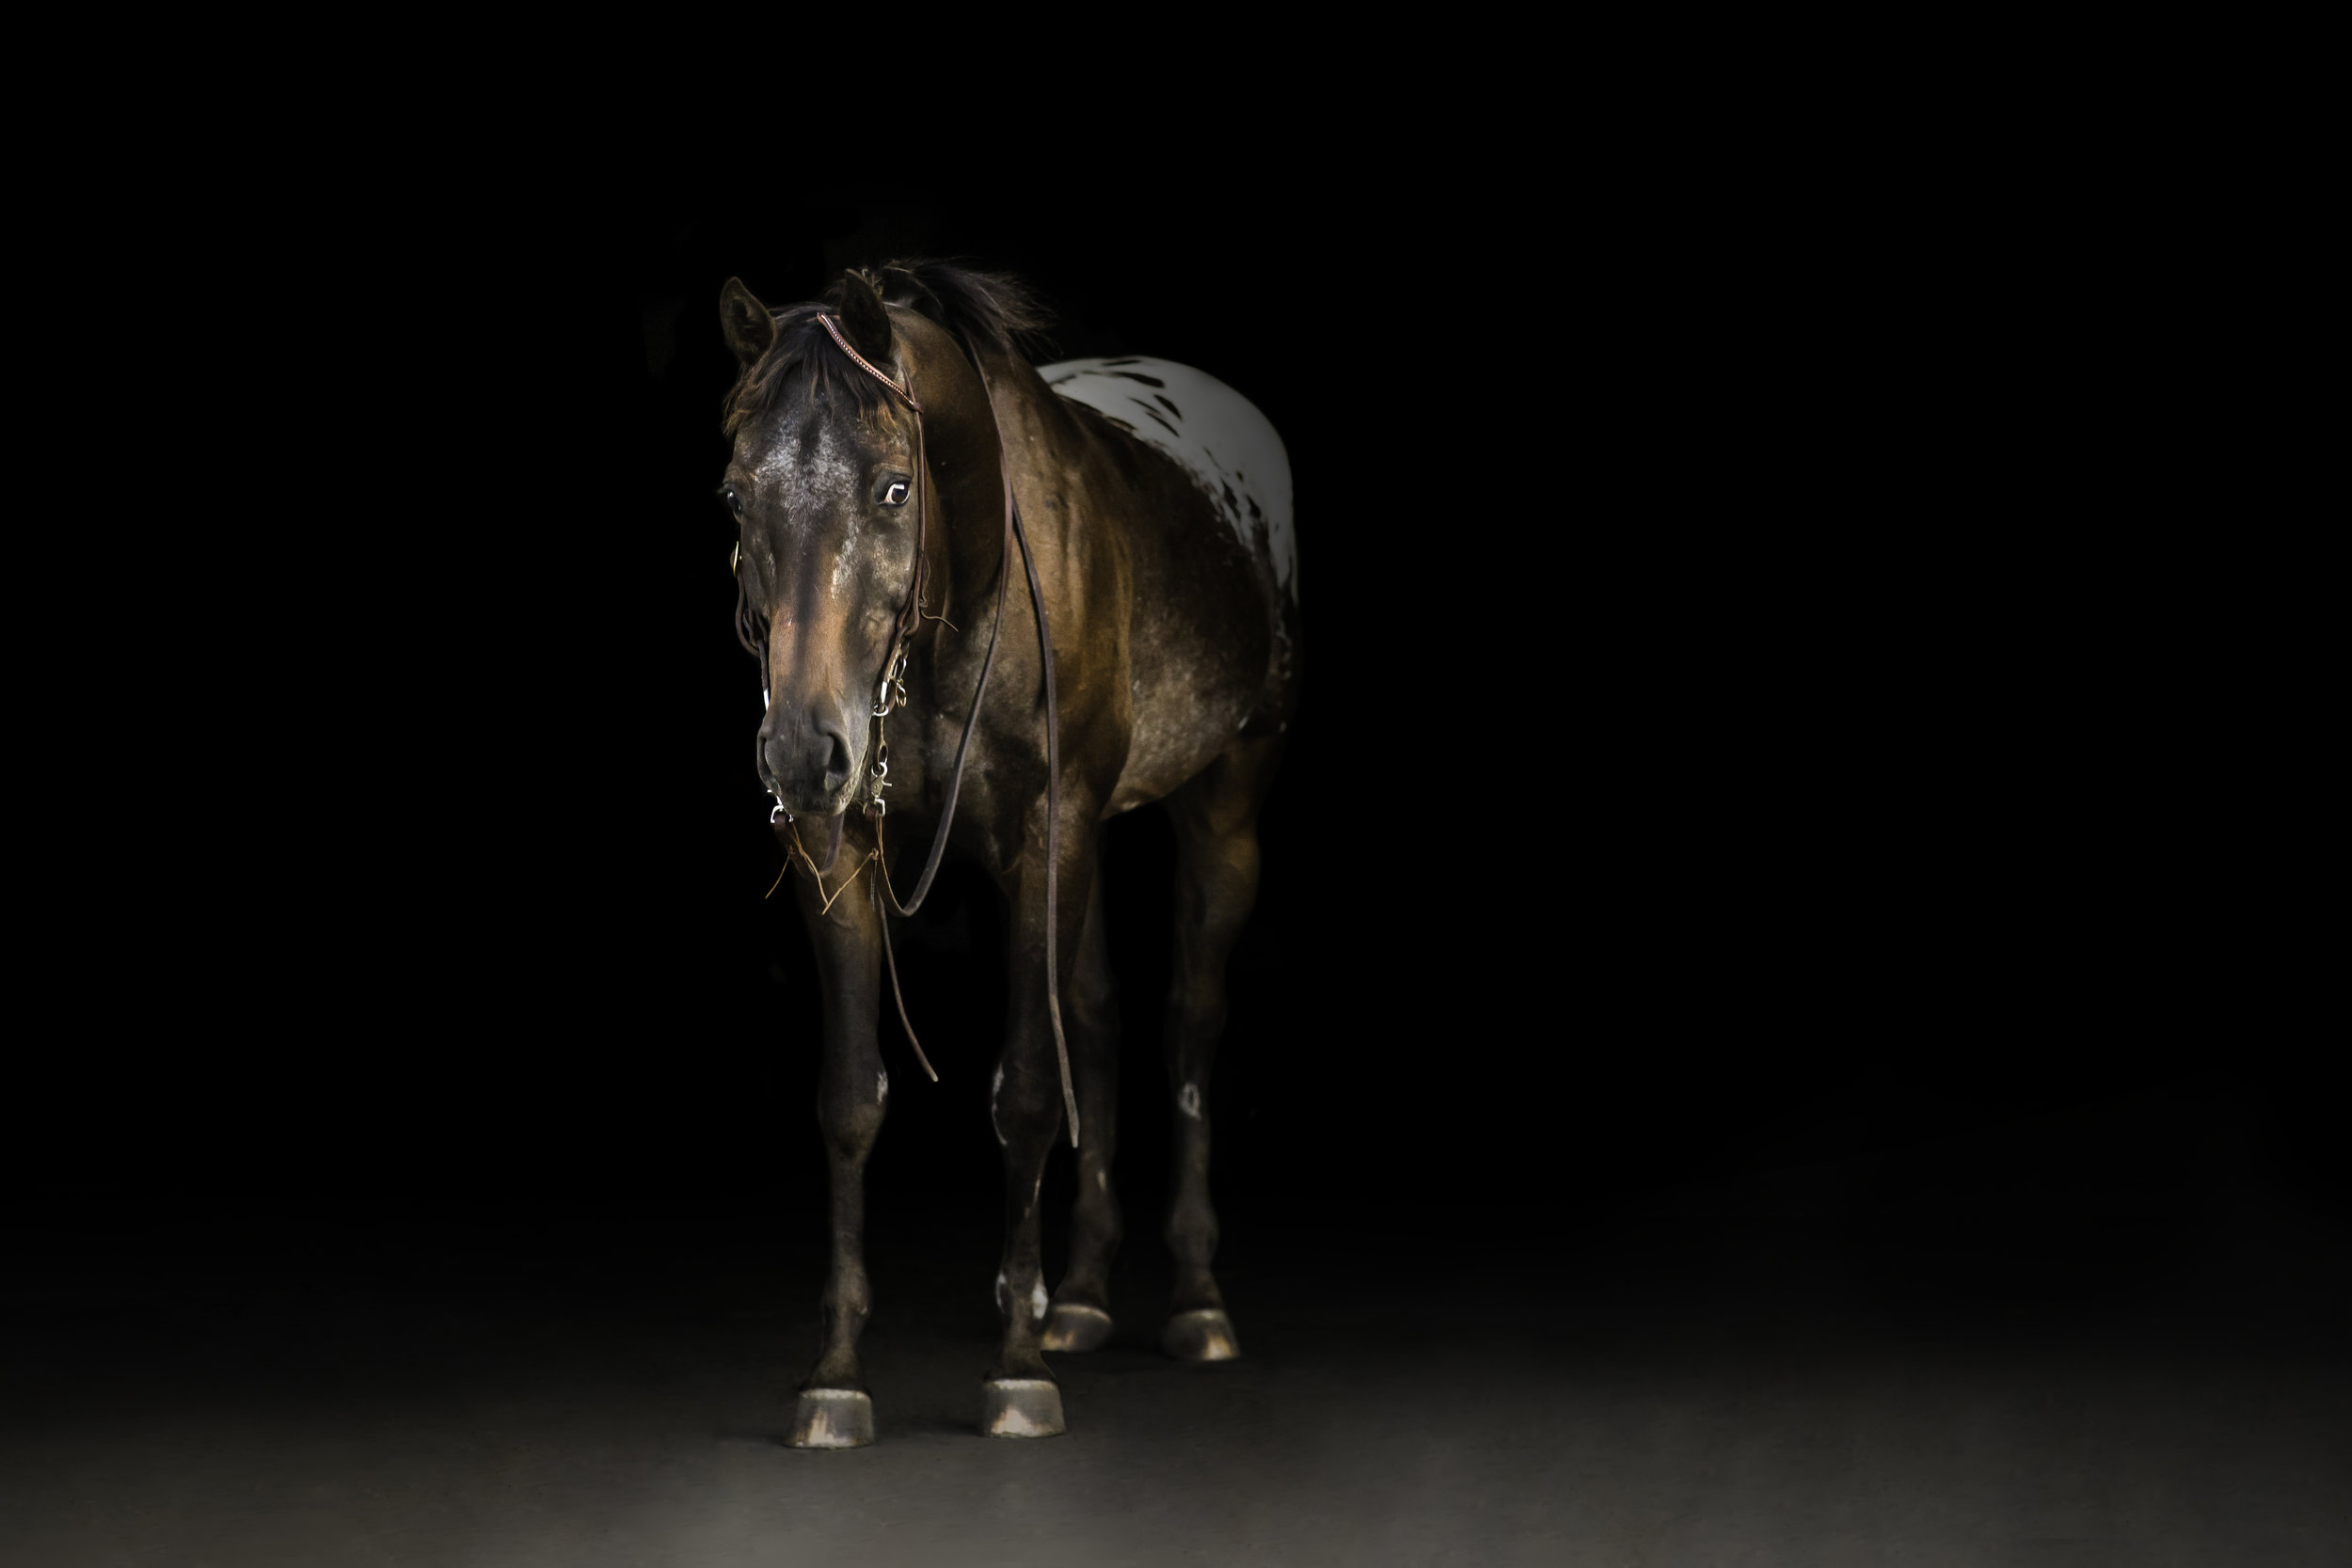 Black Background Horse Wisconsin